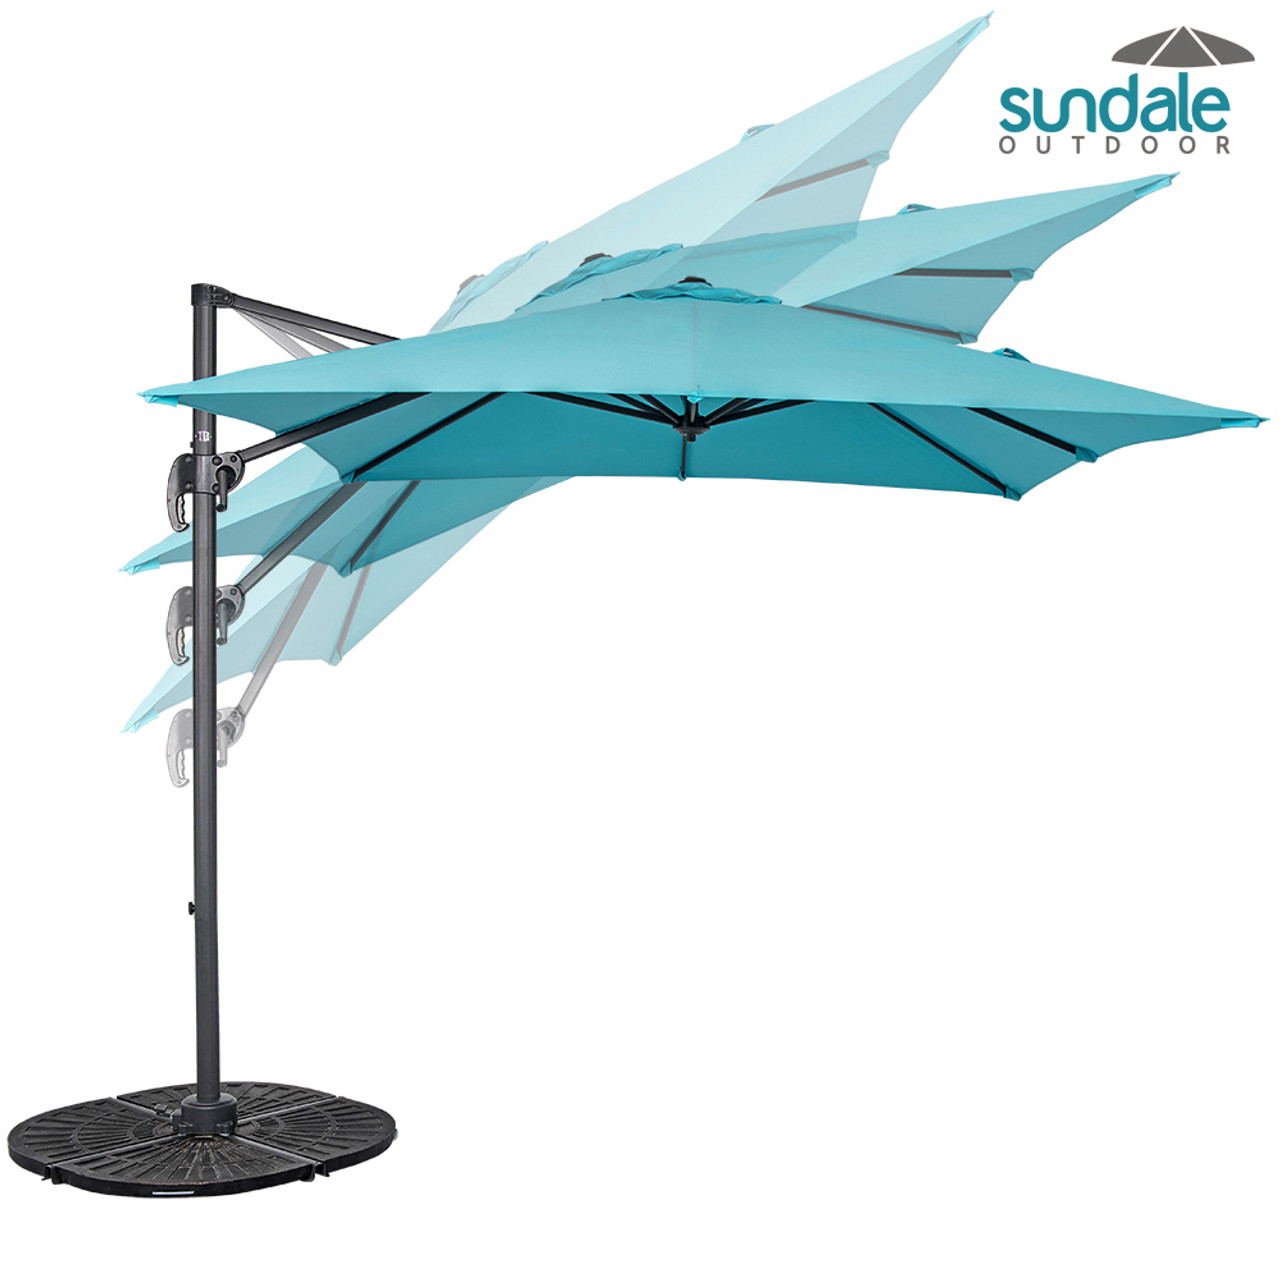 square hanging roma offset umbrella outdoor patio sun shade cantilever crank canopy light. Black Bedroom Furniture Sets. Home Design Ideas